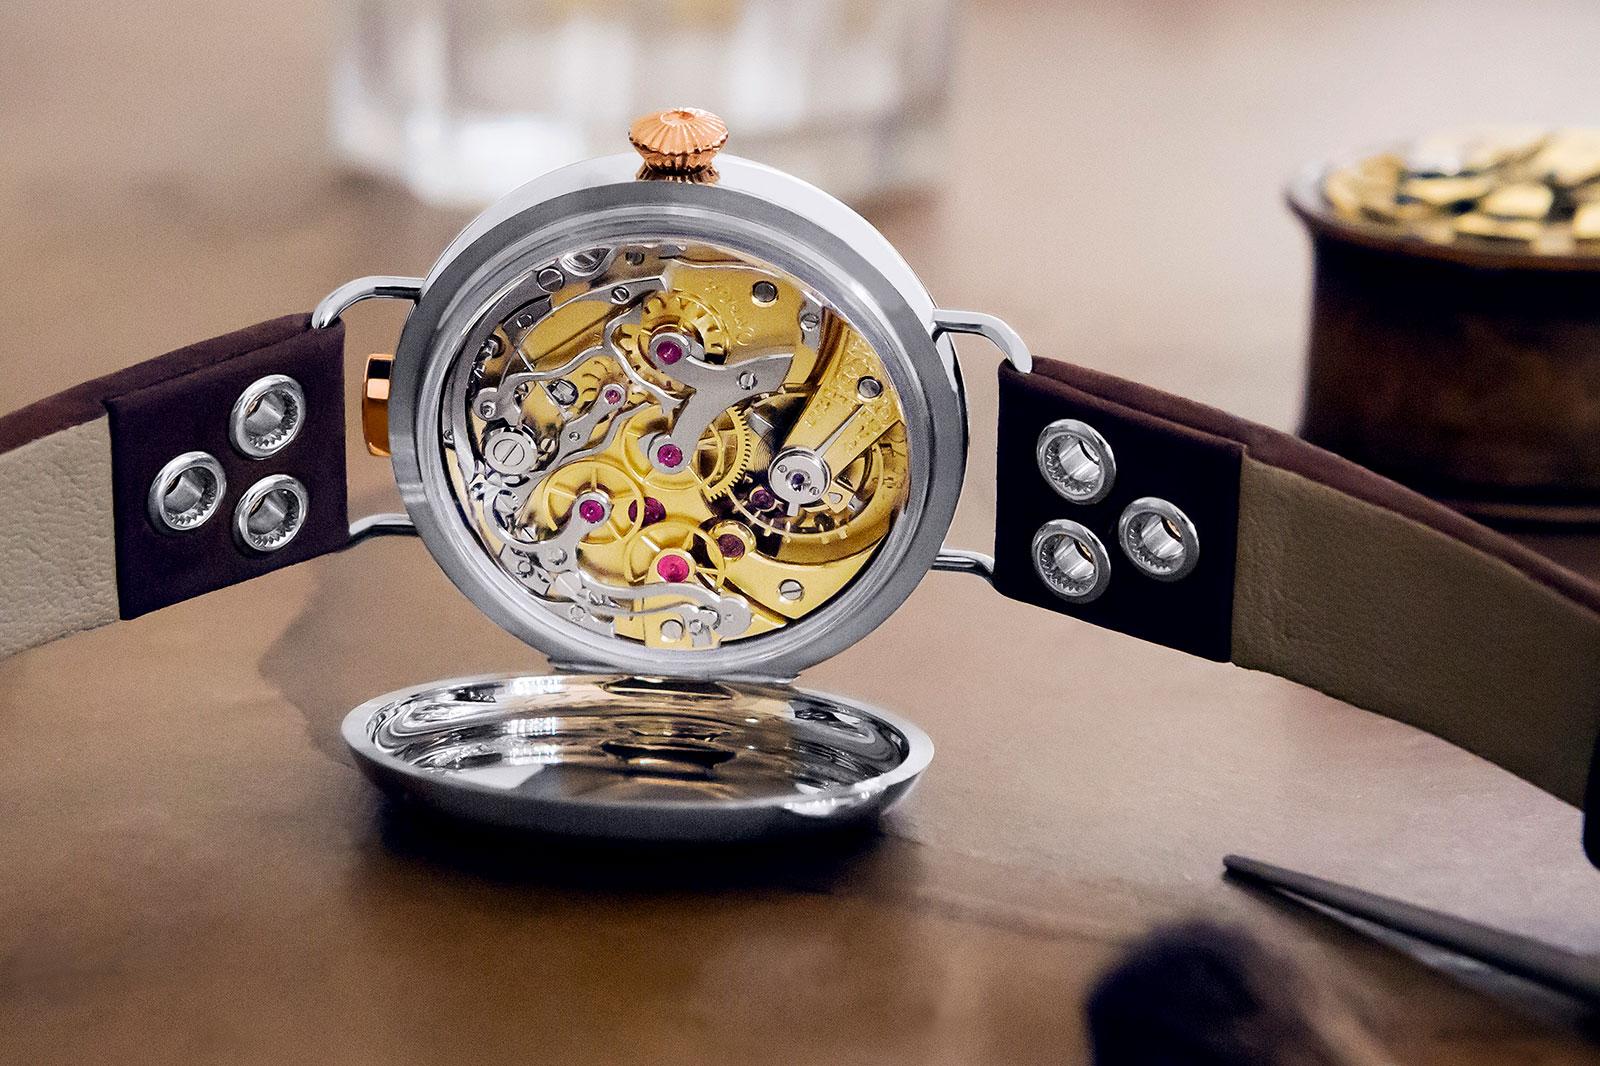 First OMEGA Wrist-Chronograph Limited Edition 18'''CHRO 4